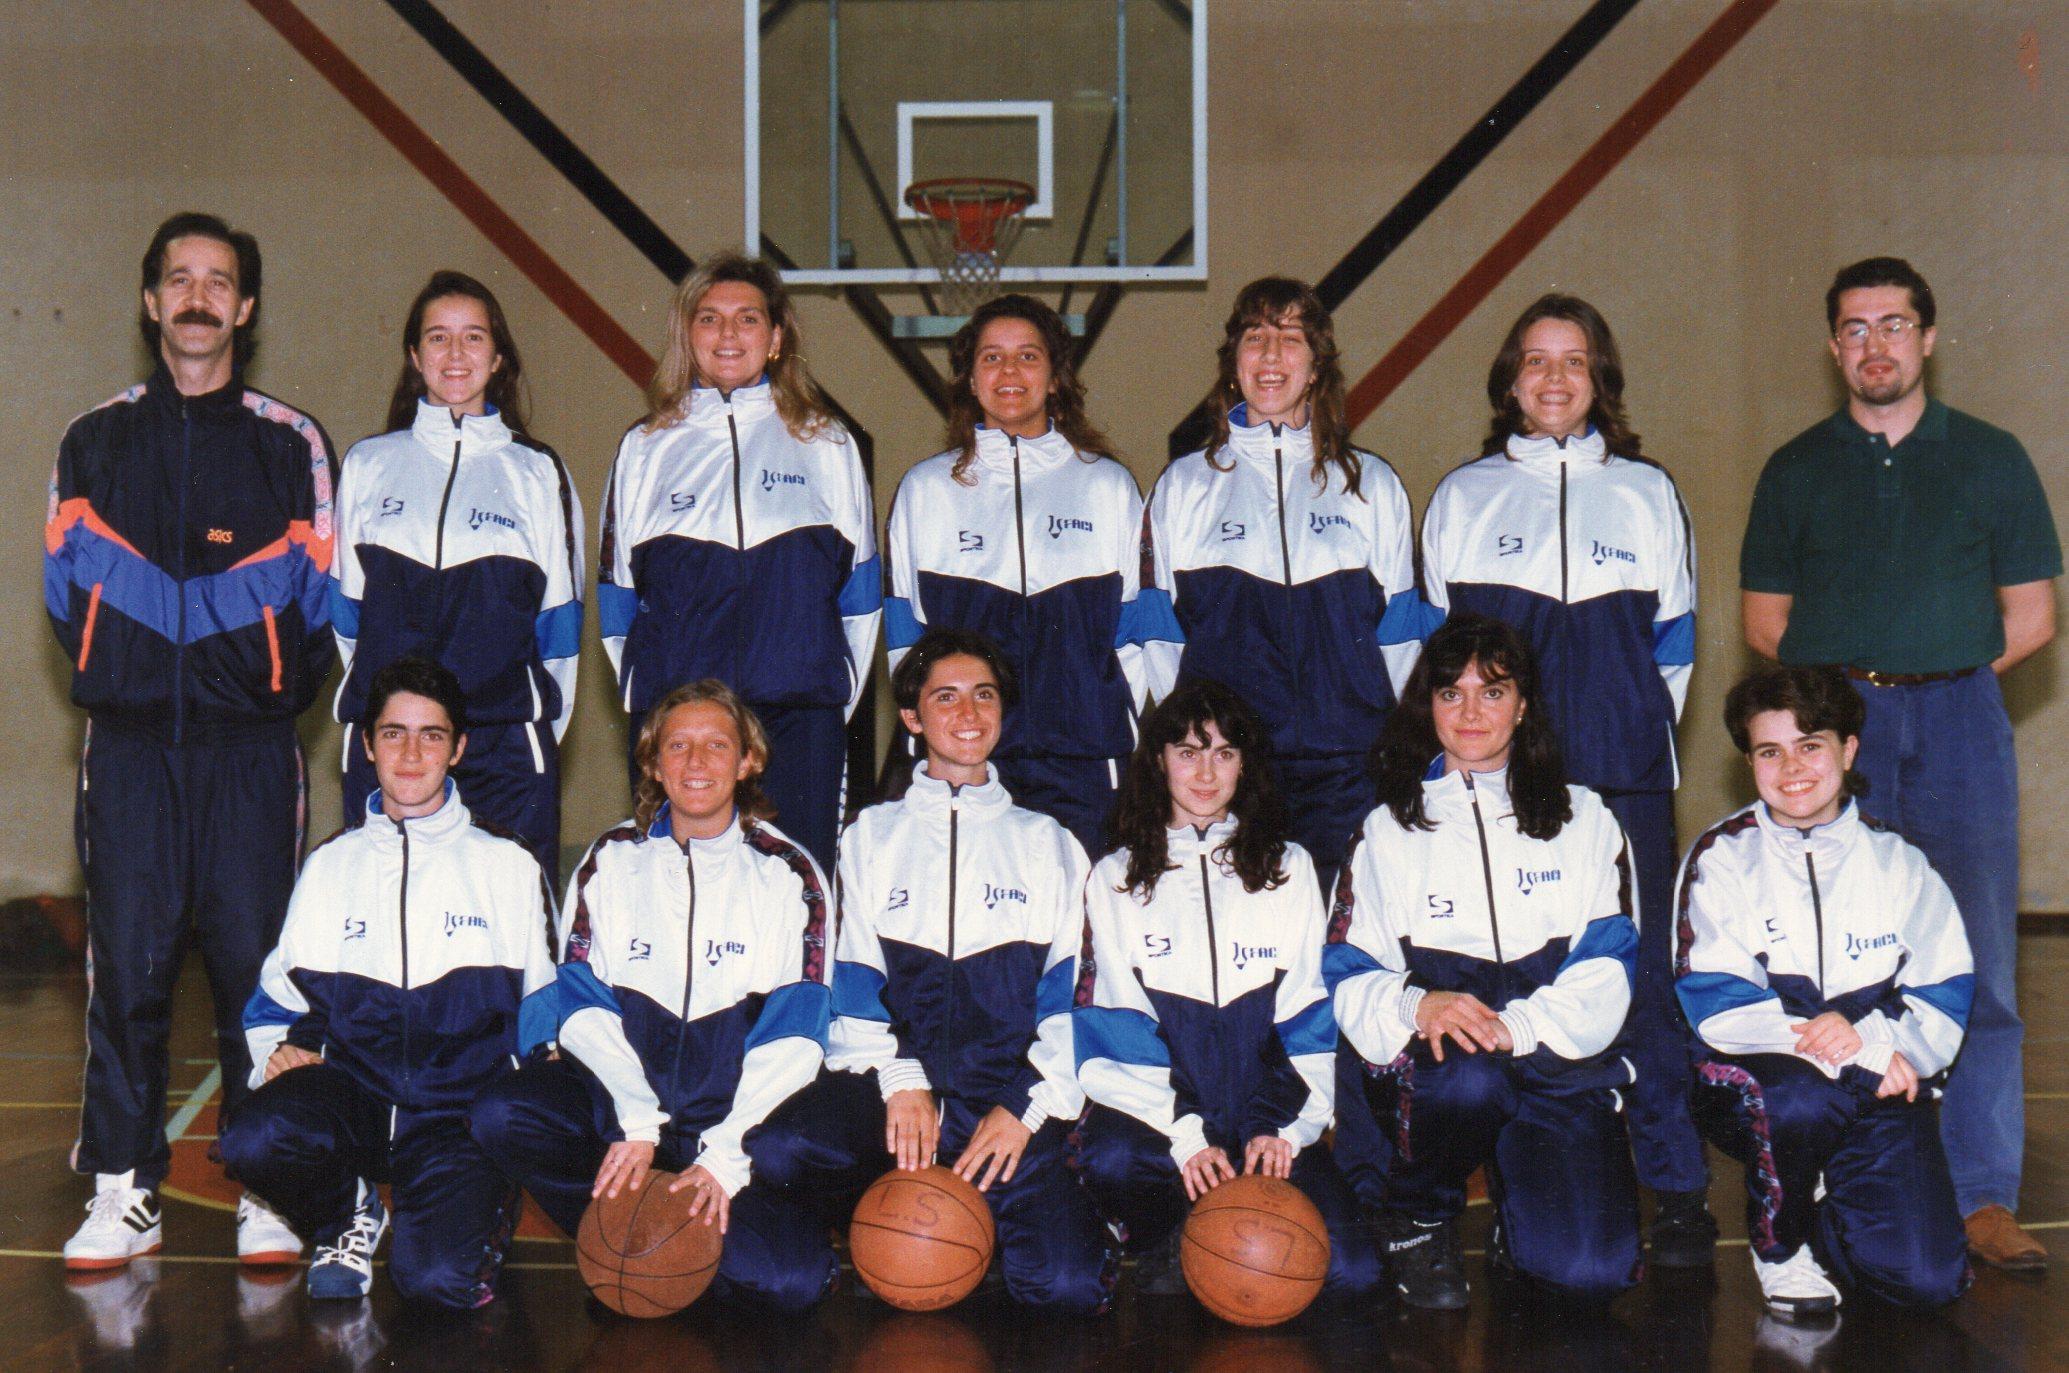 camp-to-prom-ne-femm-le-1996-1997